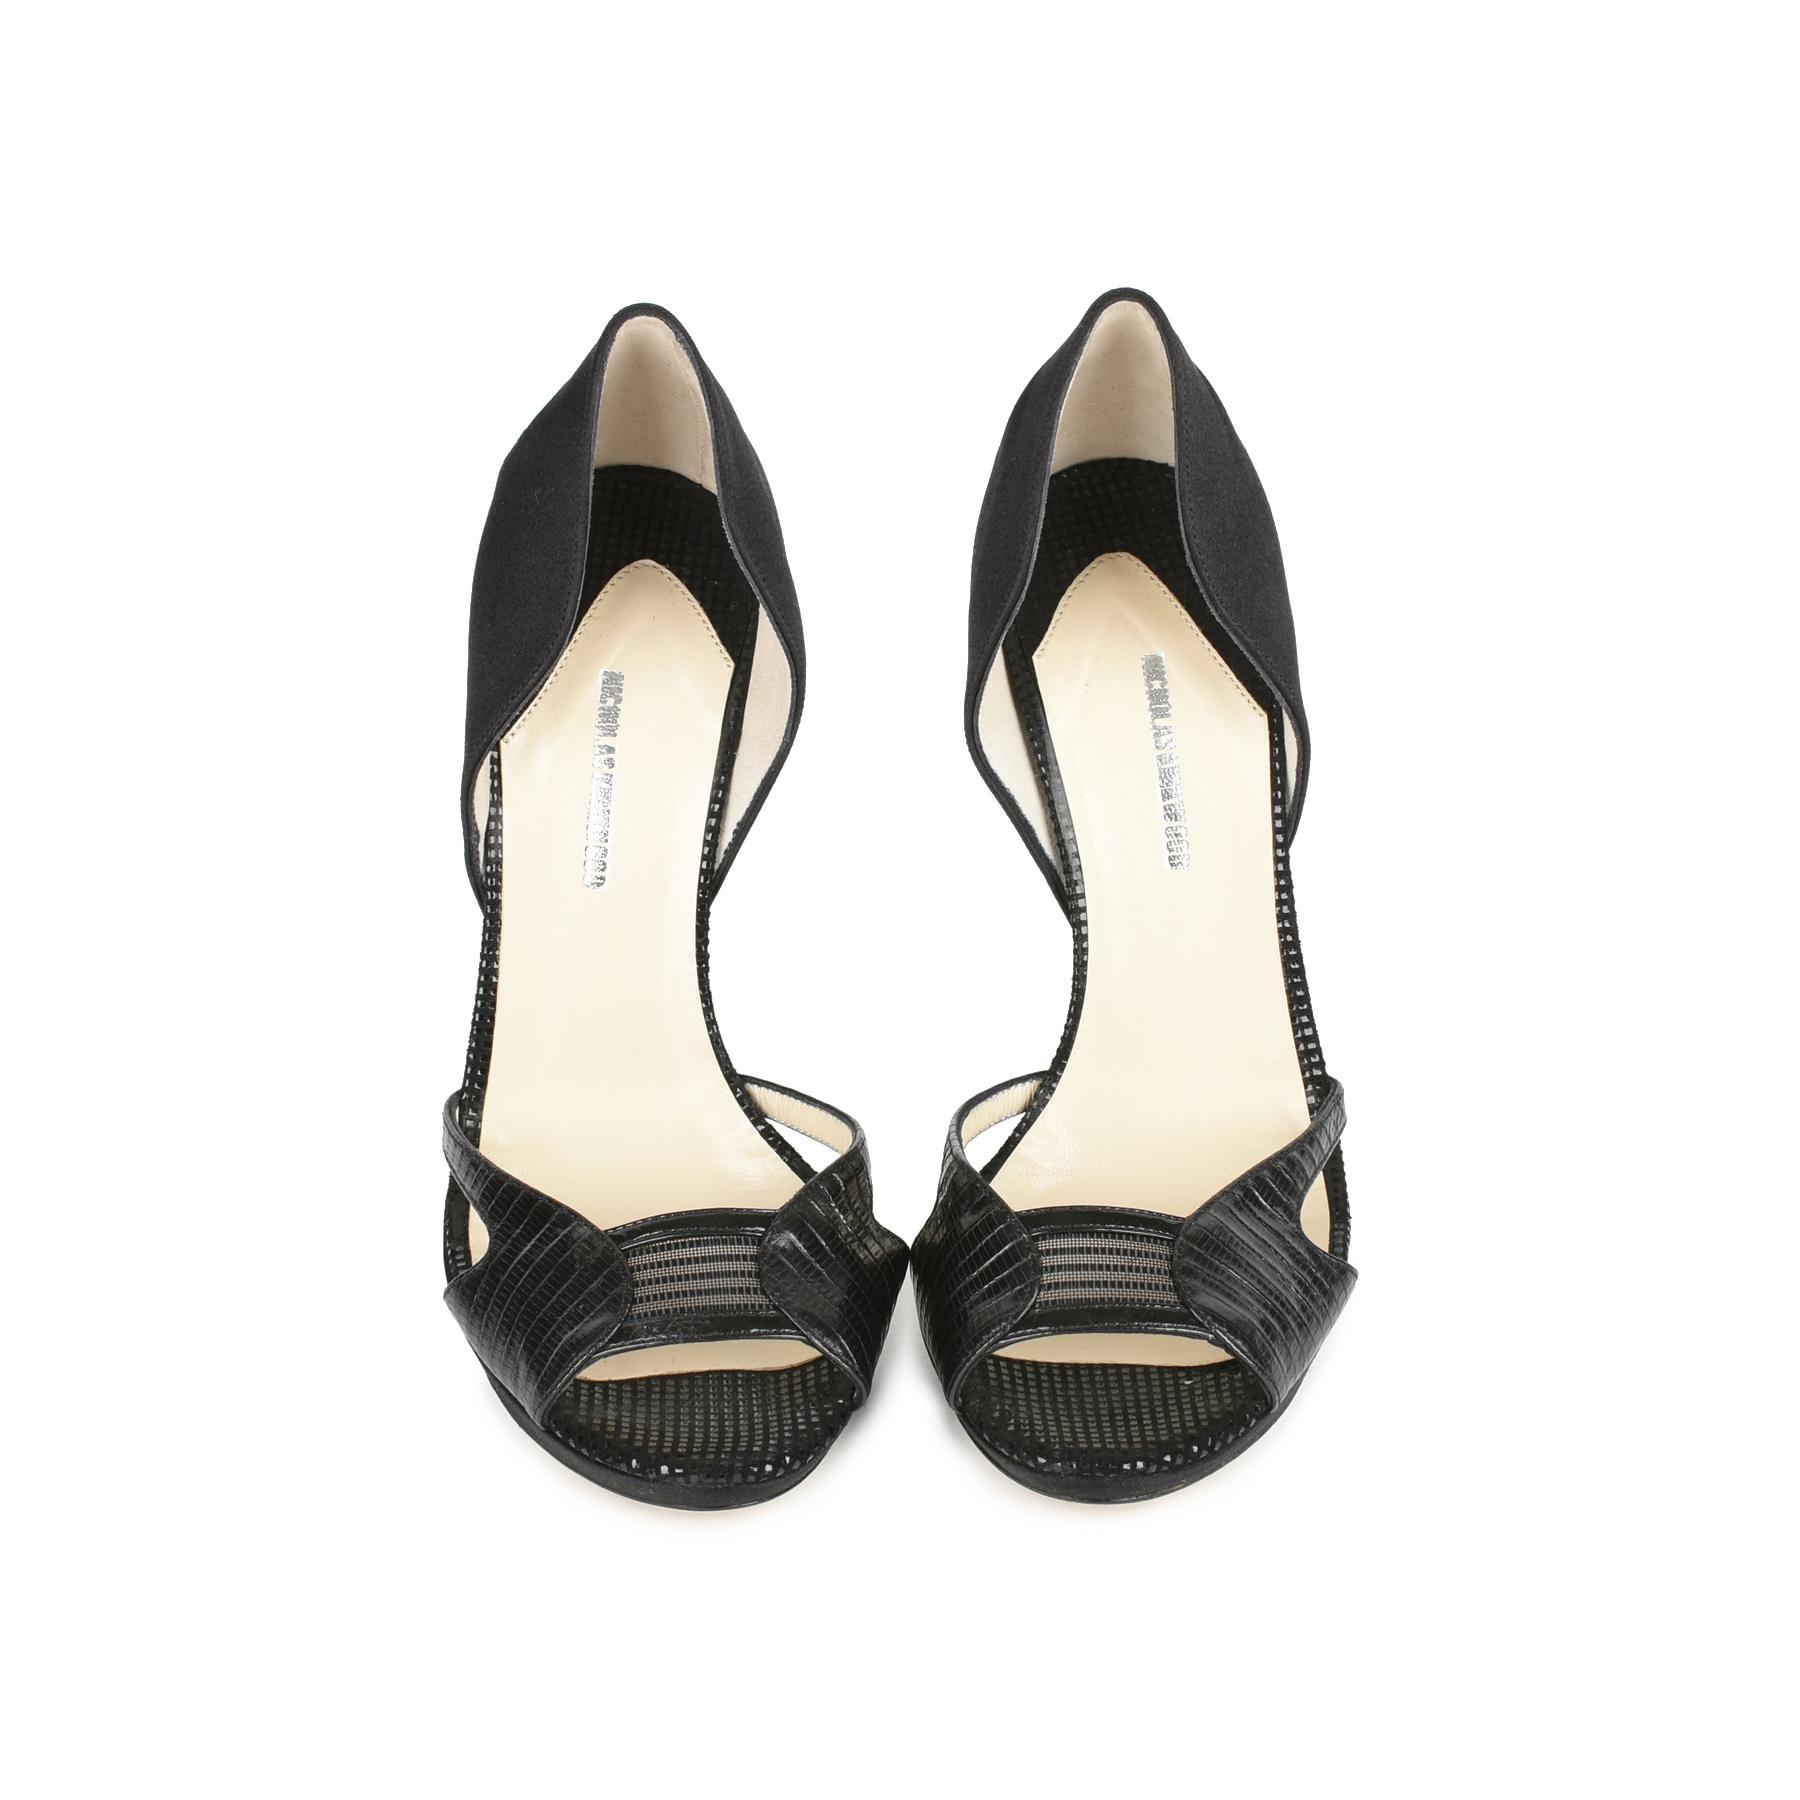 6a4e93c5196 Authentic Second Hand Nicholas Kirkwood Glitter Heel D Orsay Pumps  (PSS-080-00271)